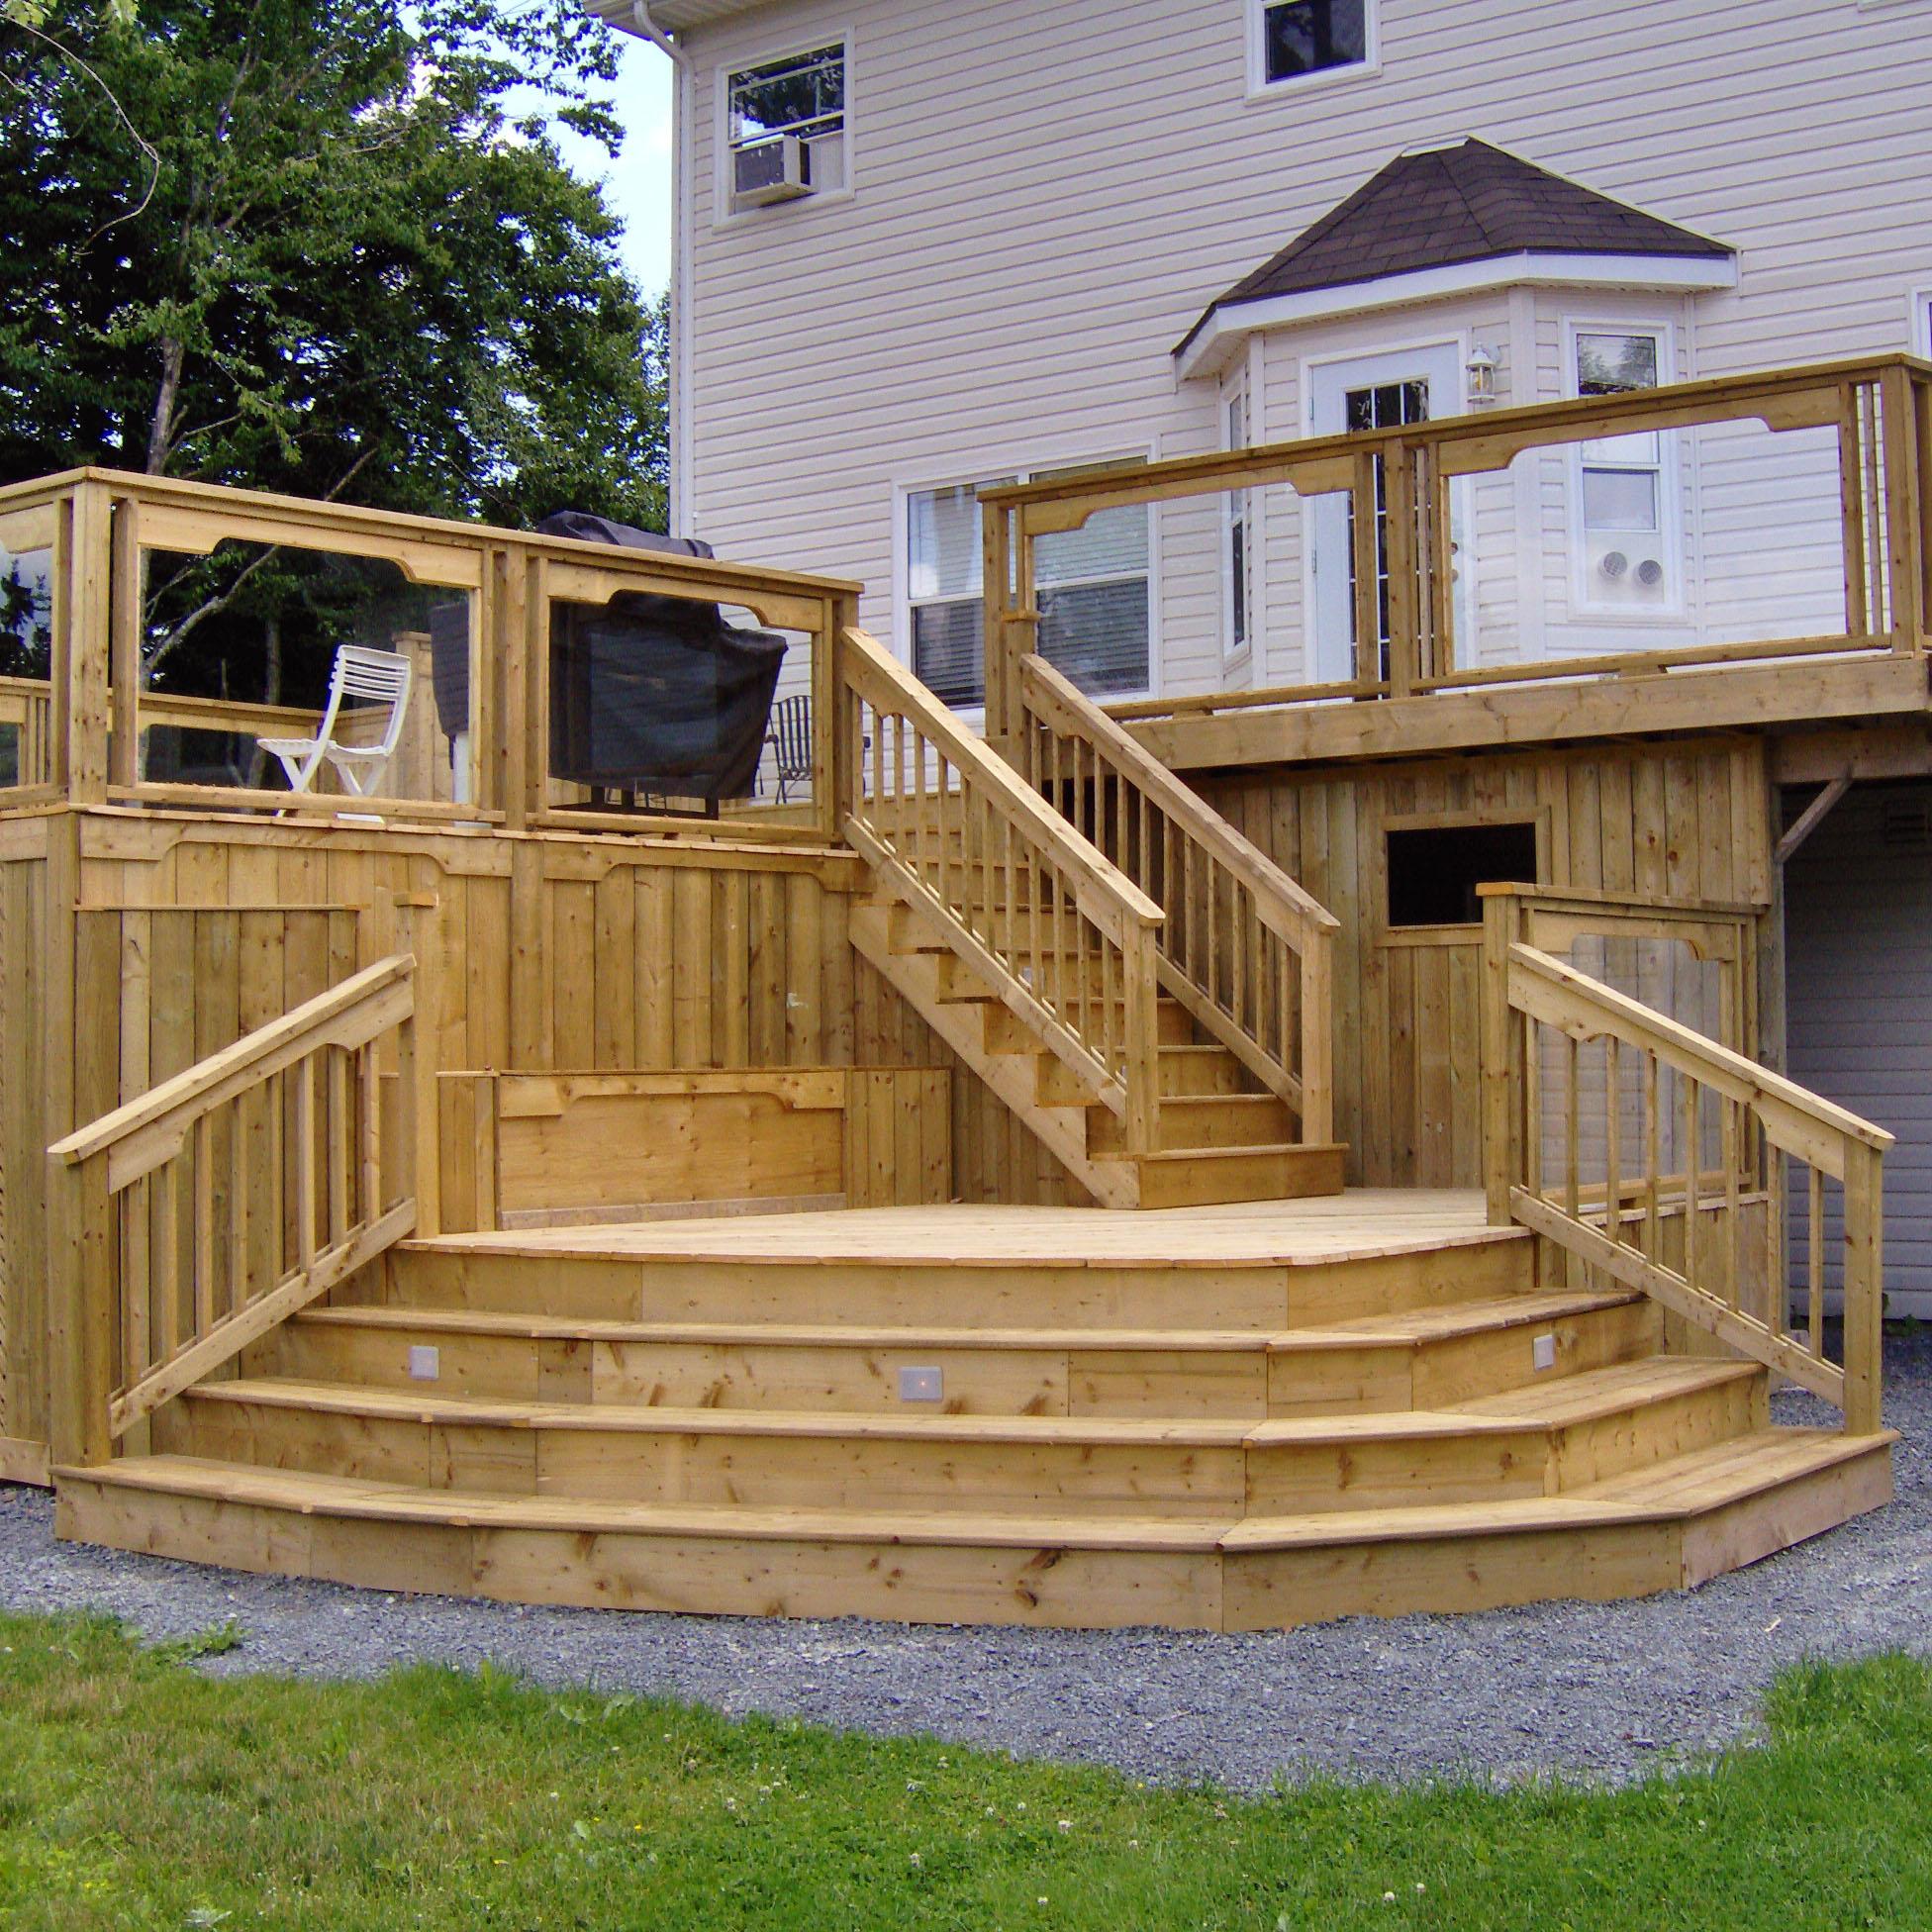 home deck designs homesfeed home deck designs. Interior Design Ideas. Home Design Ideas